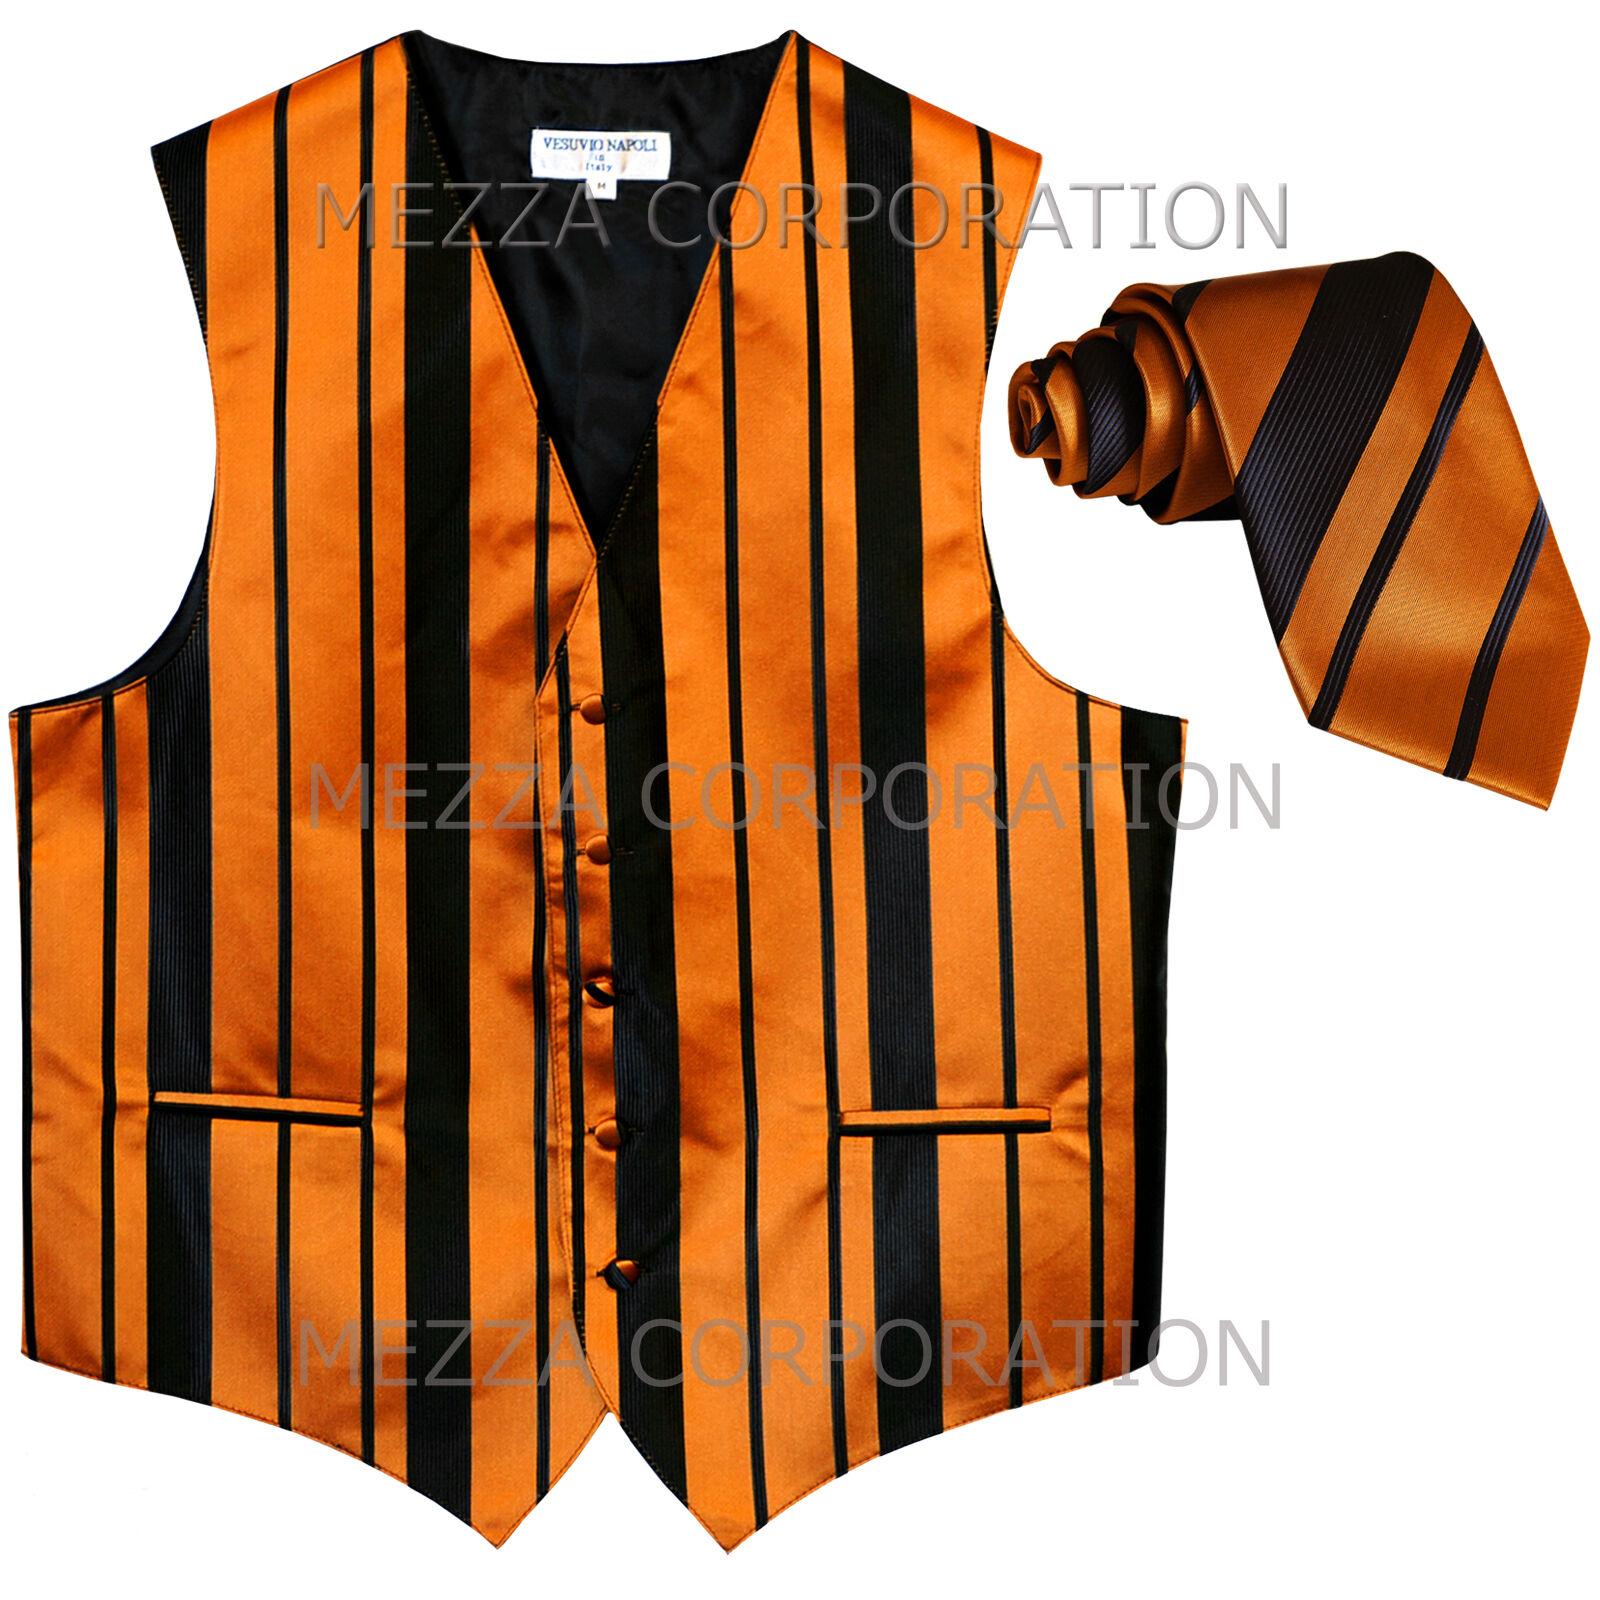 New Men's Tuxedo Vest Waistcoat Stripes Necktie prom wedding party Black Gold